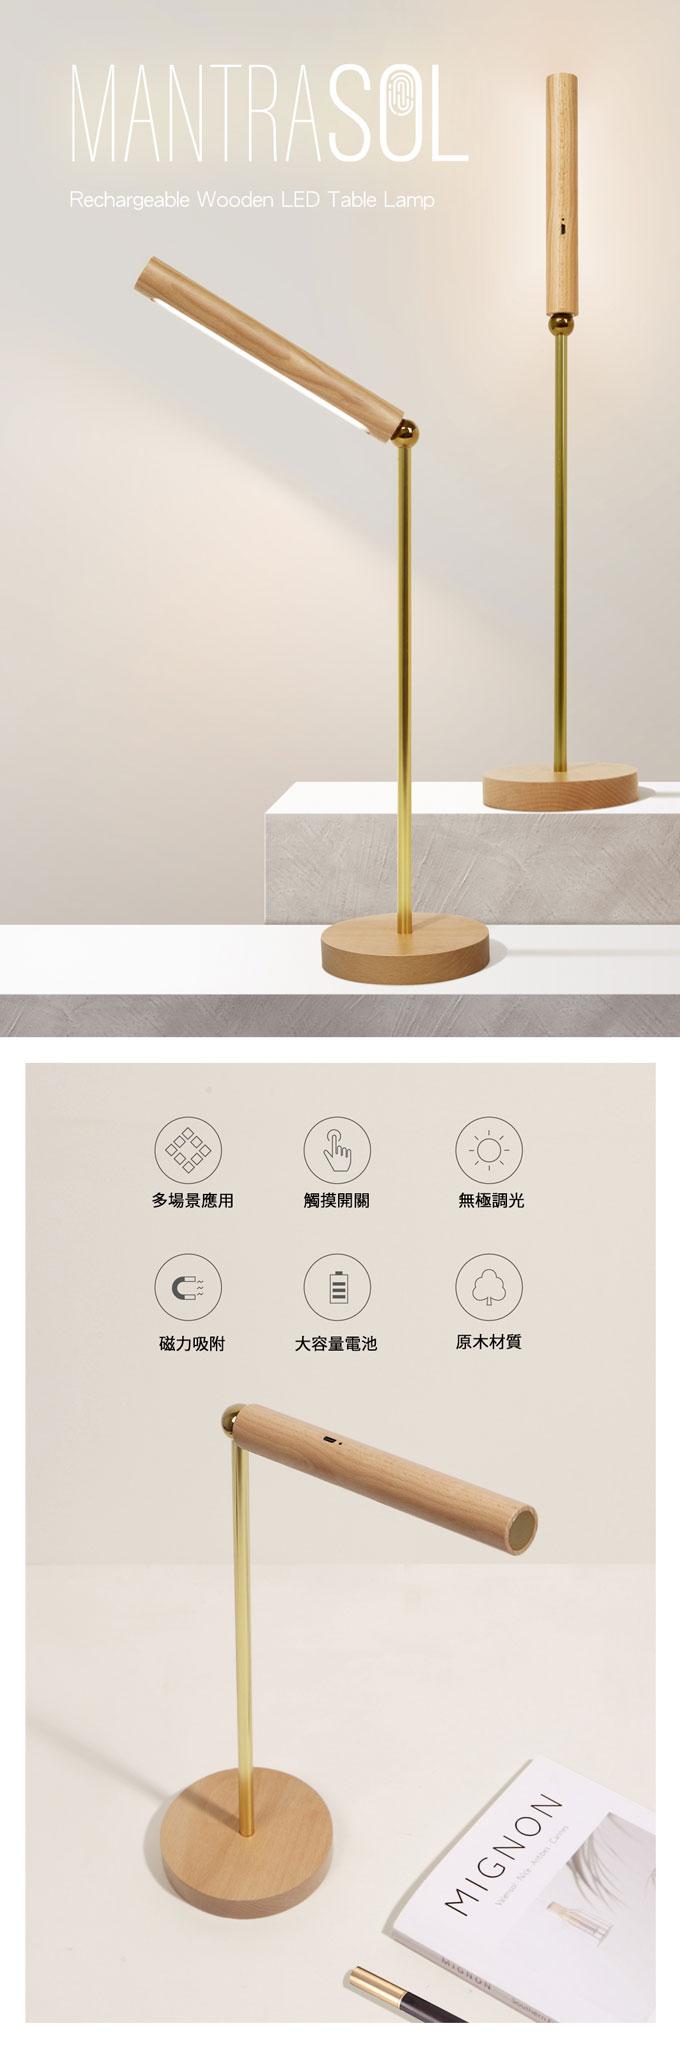 【集購】MANTRA SOL|360° 磁吸旋轉多功能LED觸控燈